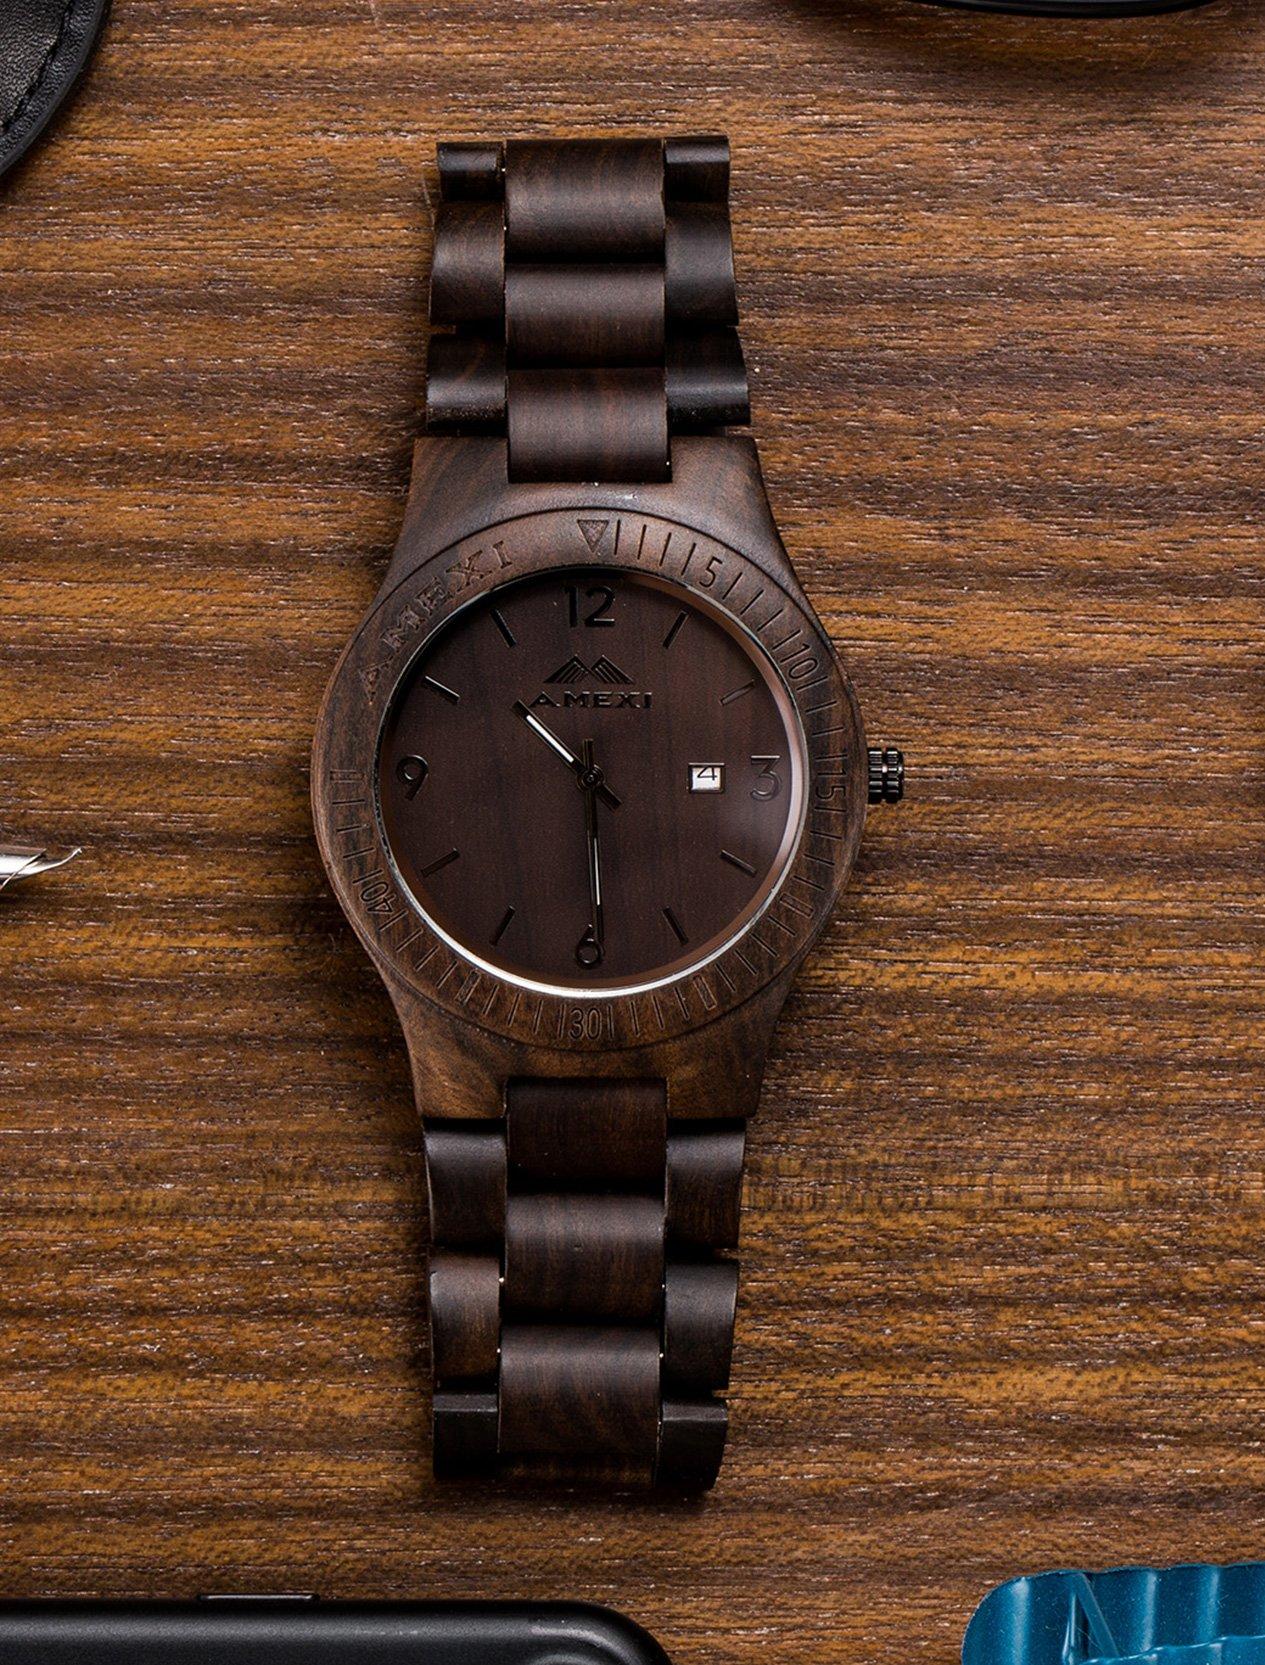 Amexi Holzuhr Herren Uhren aus Holz Ebenholz Holz Uhren Armbanduhr Herren Männer mit Miyota Quarz Uhrwerk (Schwarz)